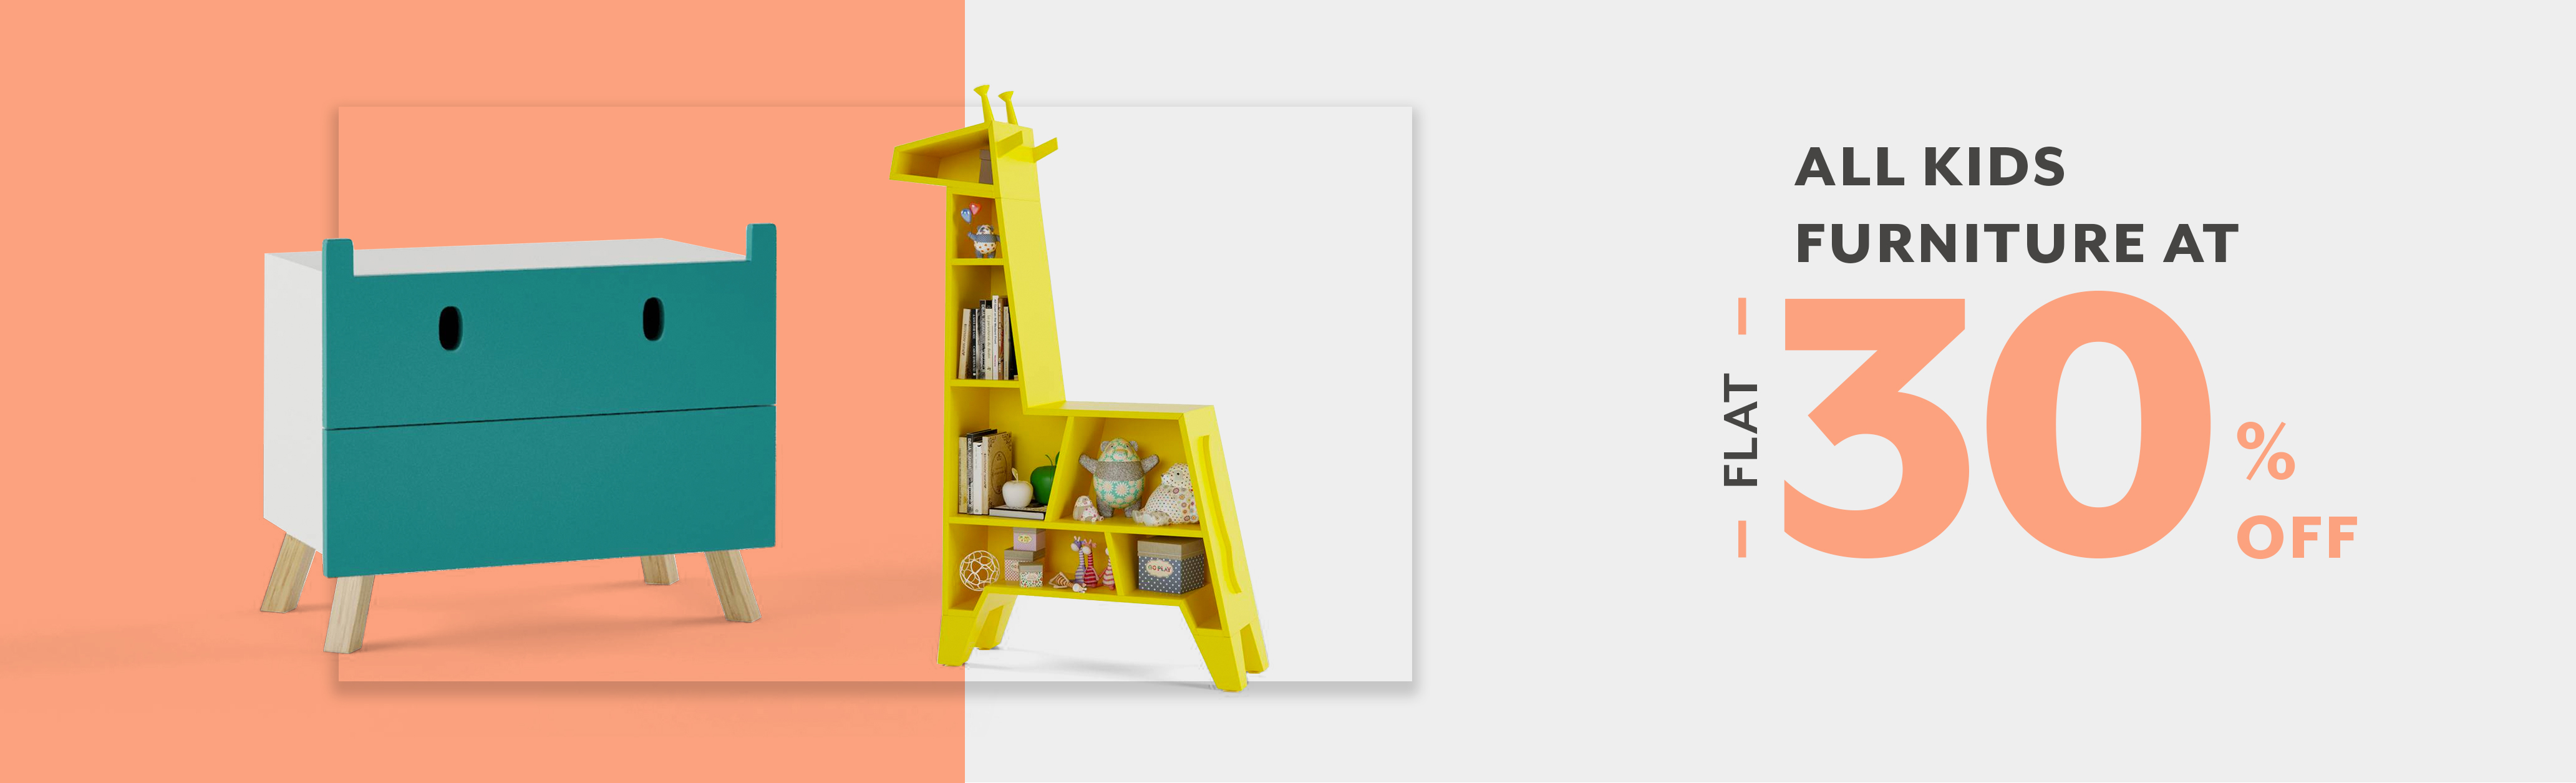 All kids furniture